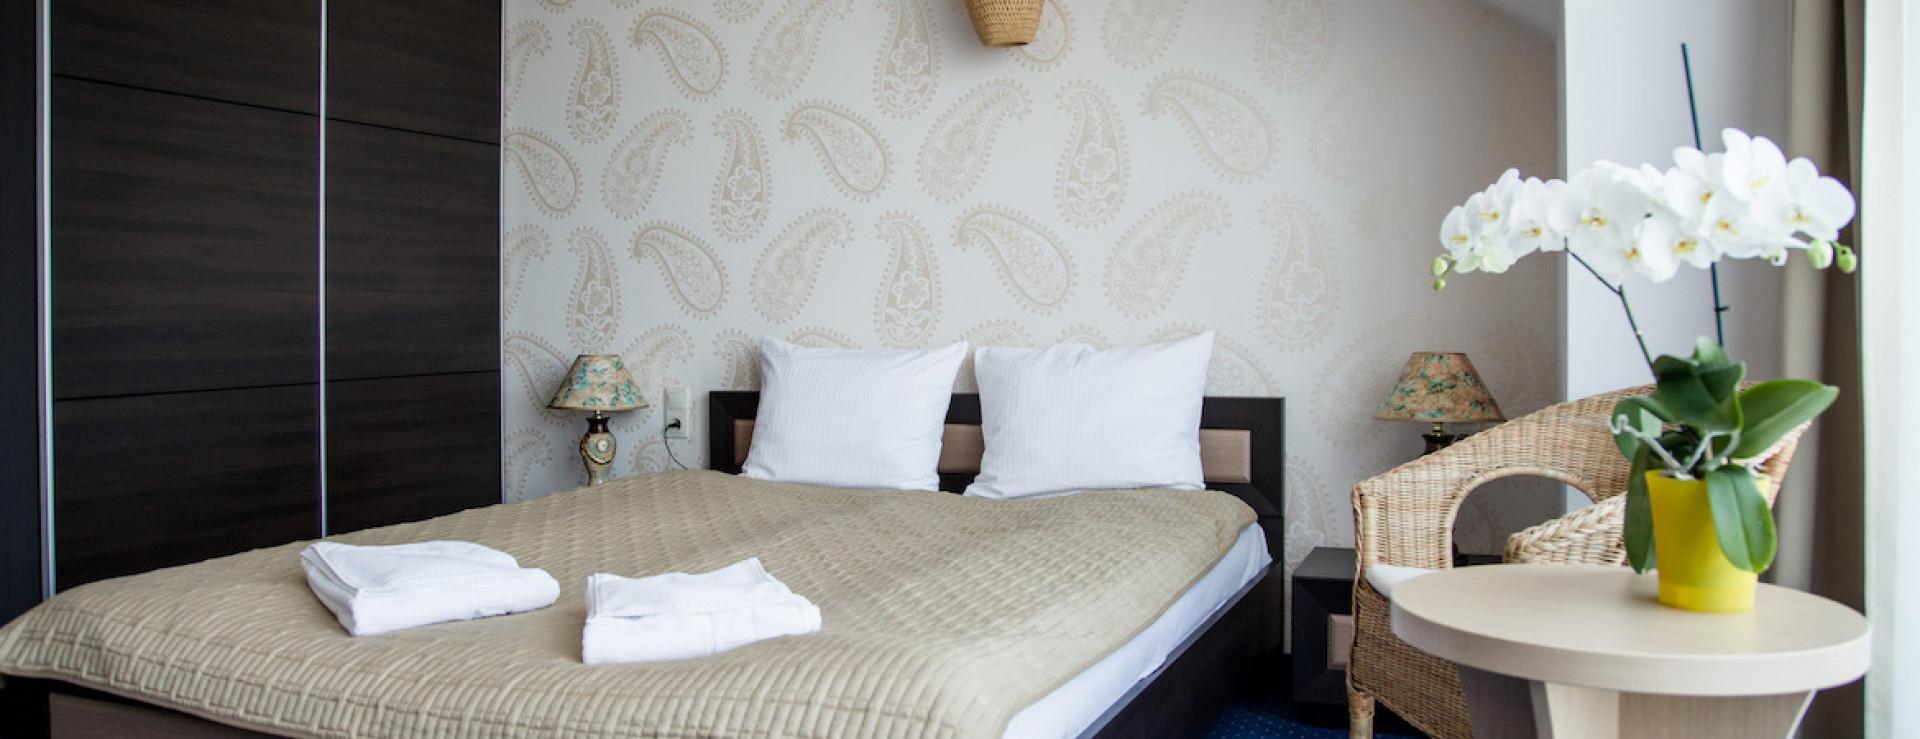 Majówka w Hotelu Jastarnia***